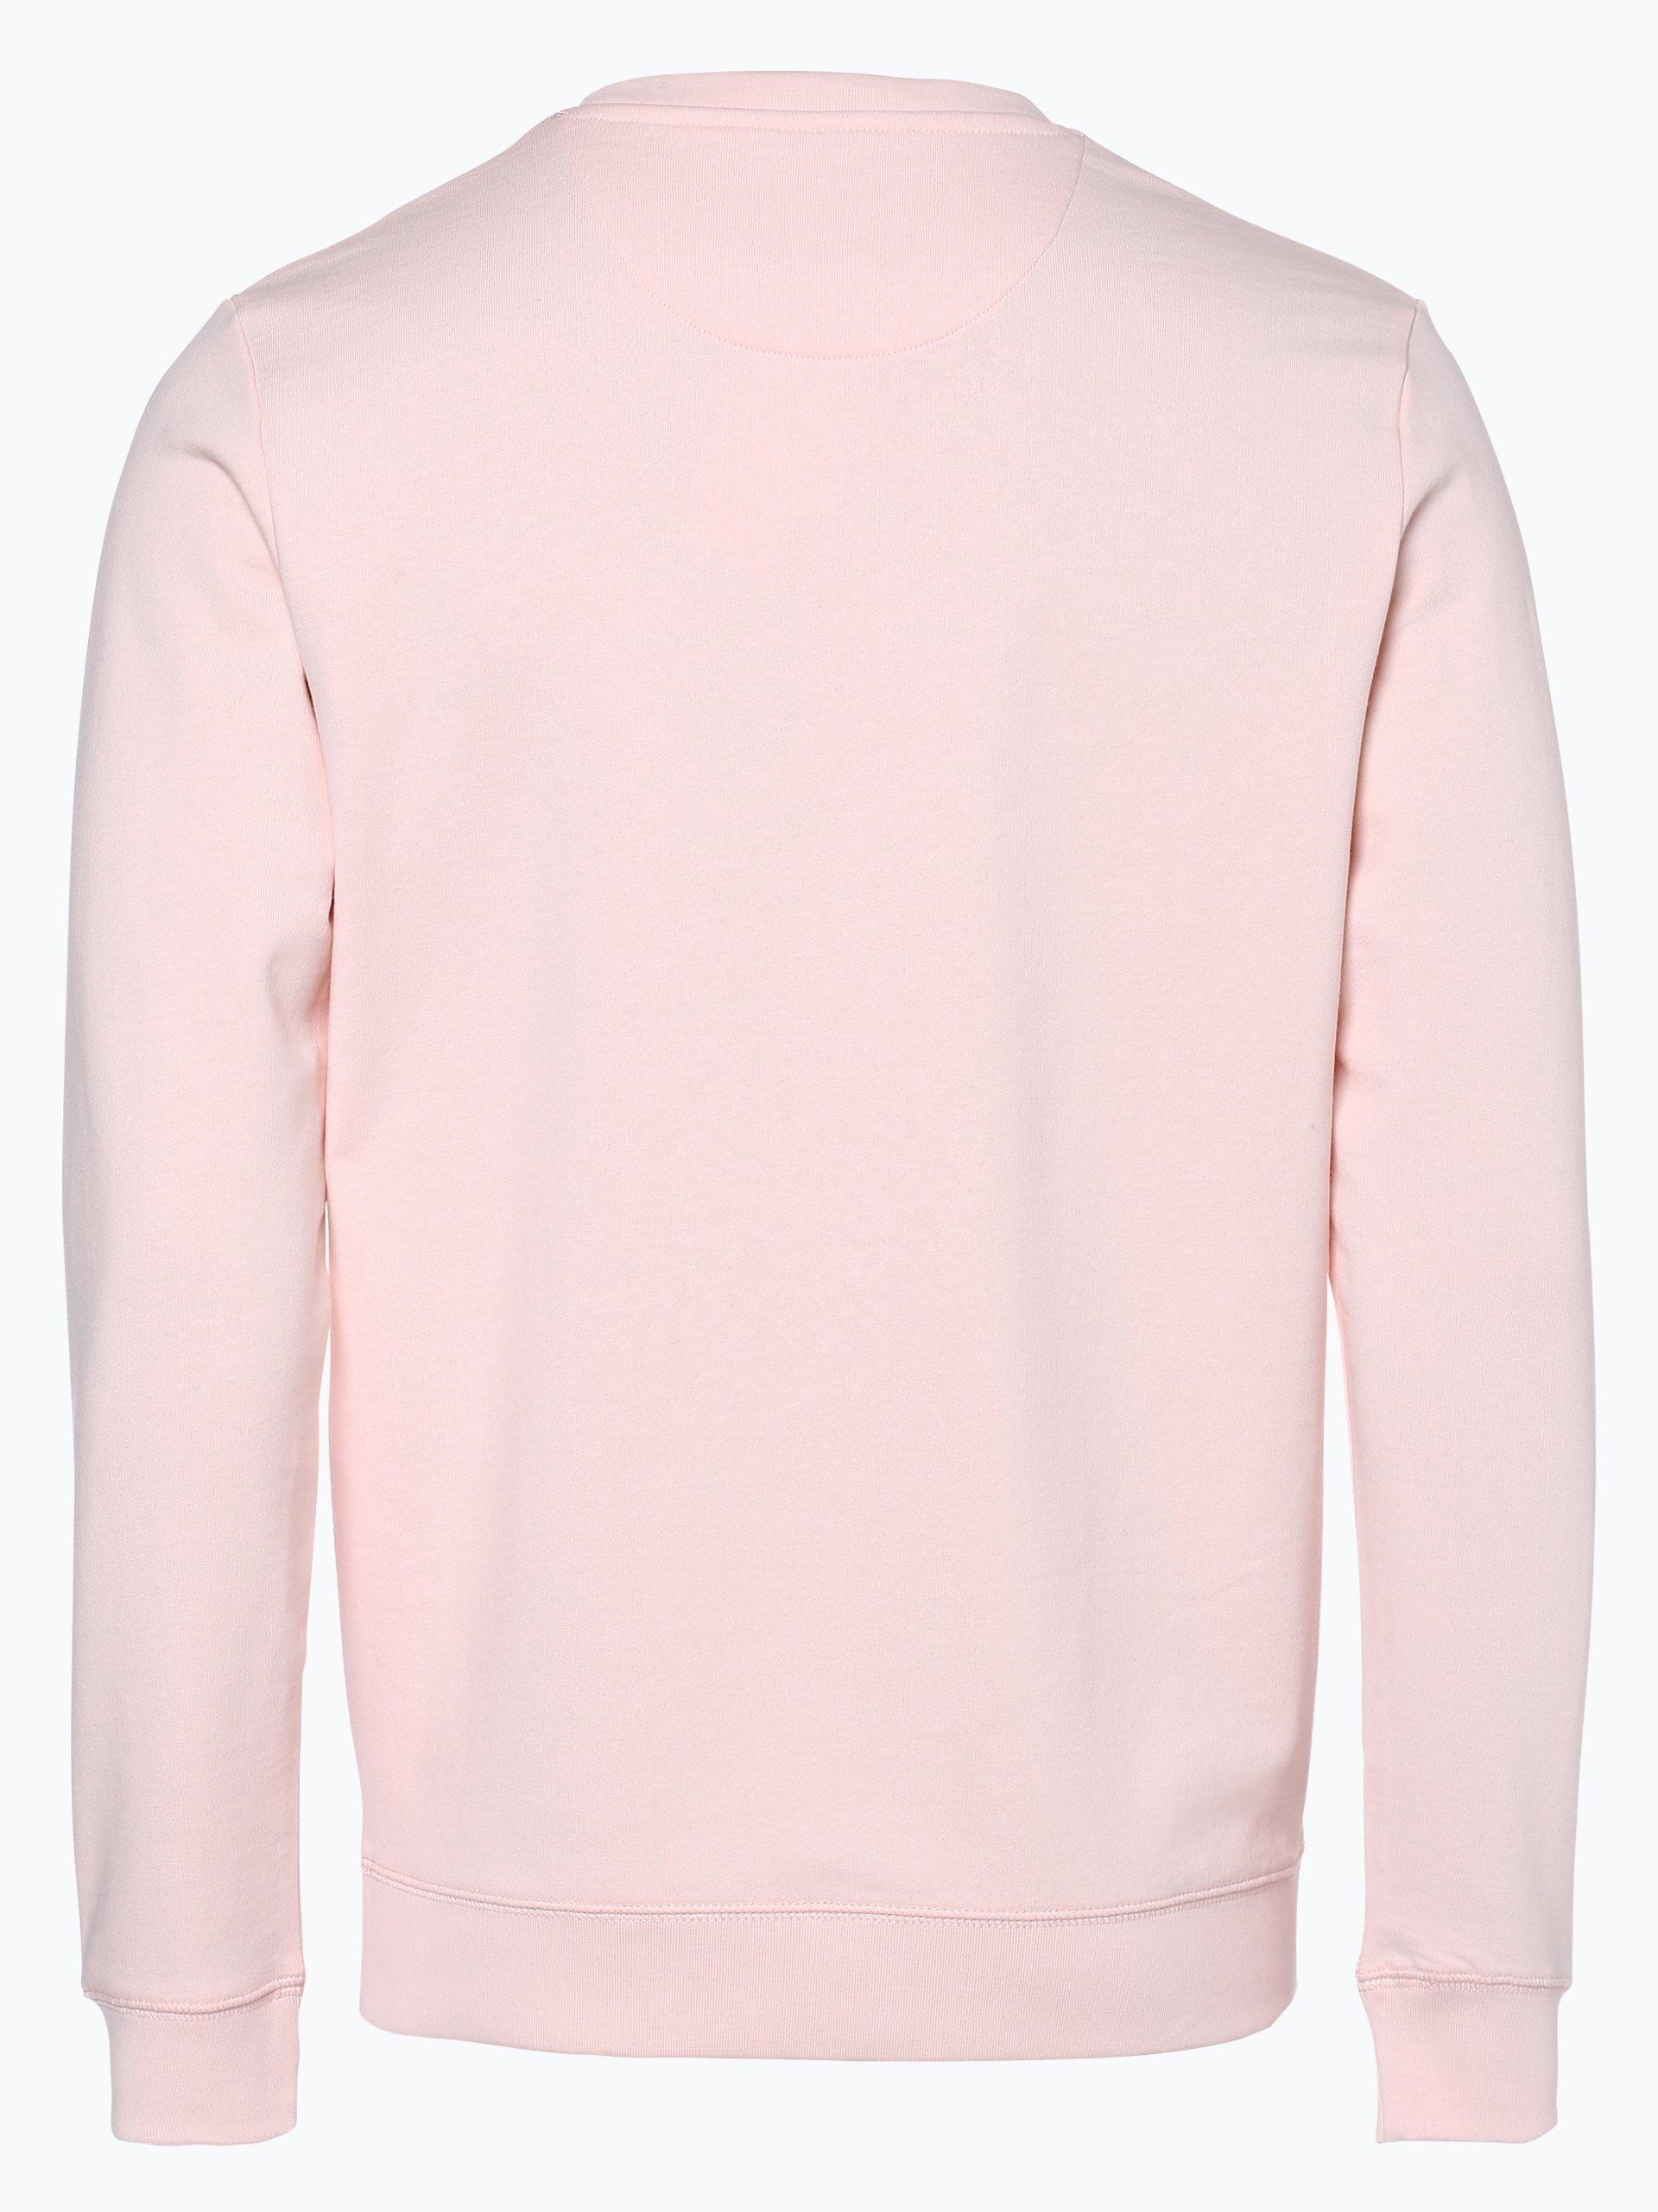 Finshley & Harding London Męska bluza nierozpinana